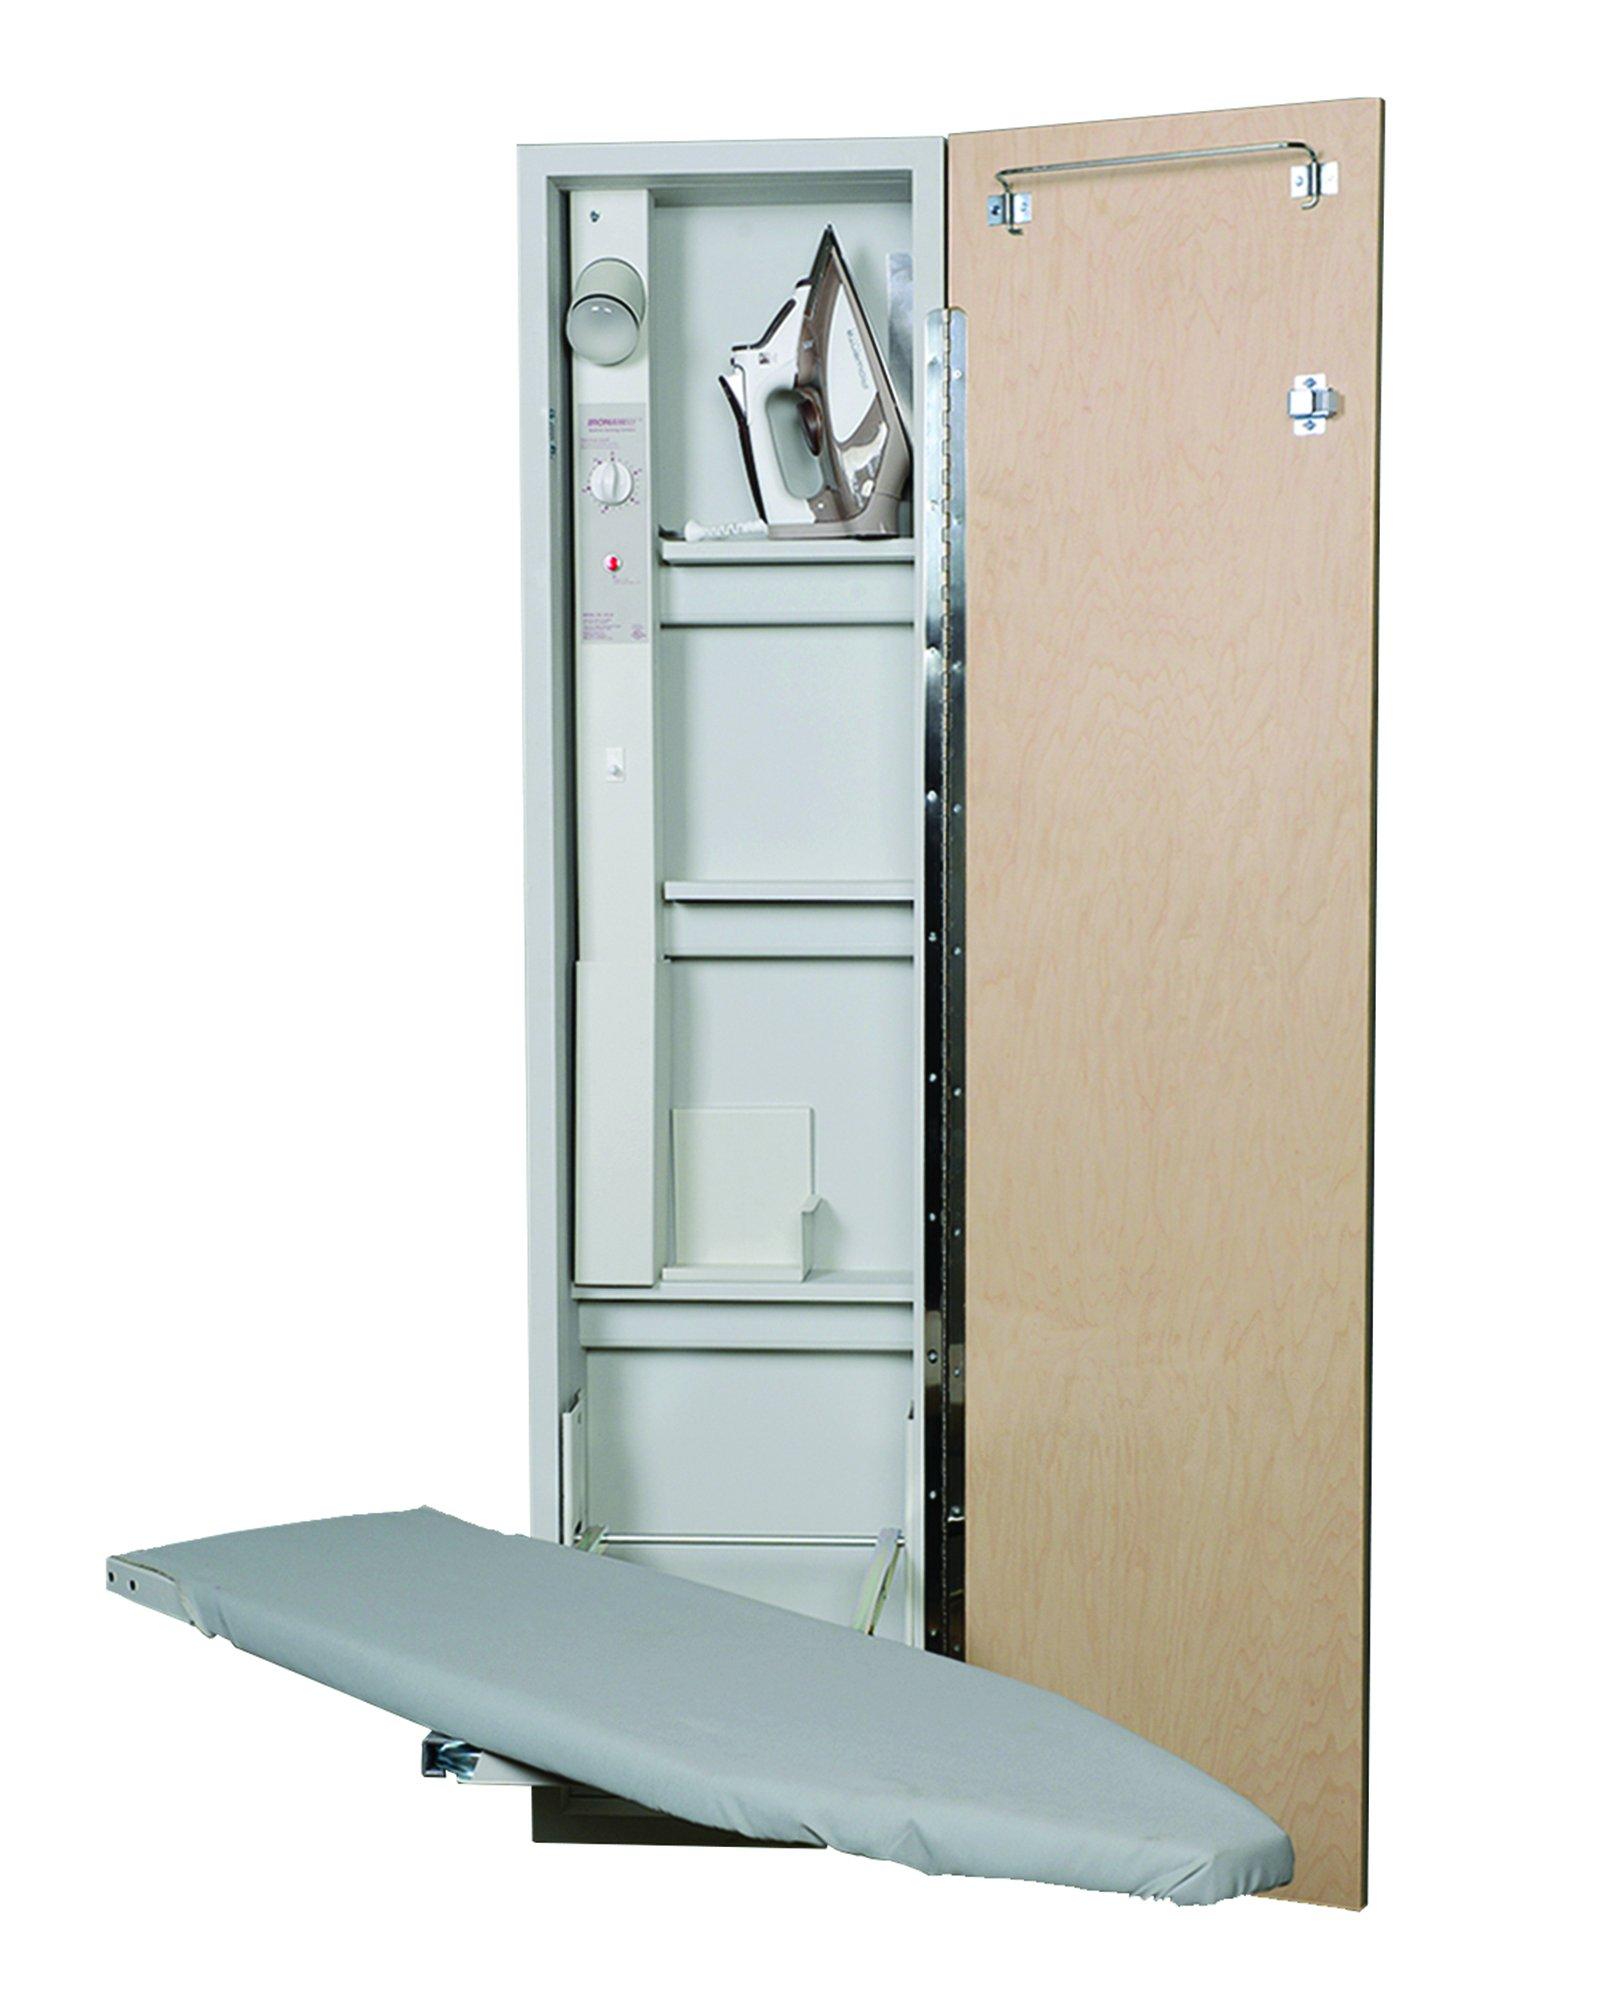 Iron A Way AE-46 Premium Electric Swivel Ironing Center, Flat White Door